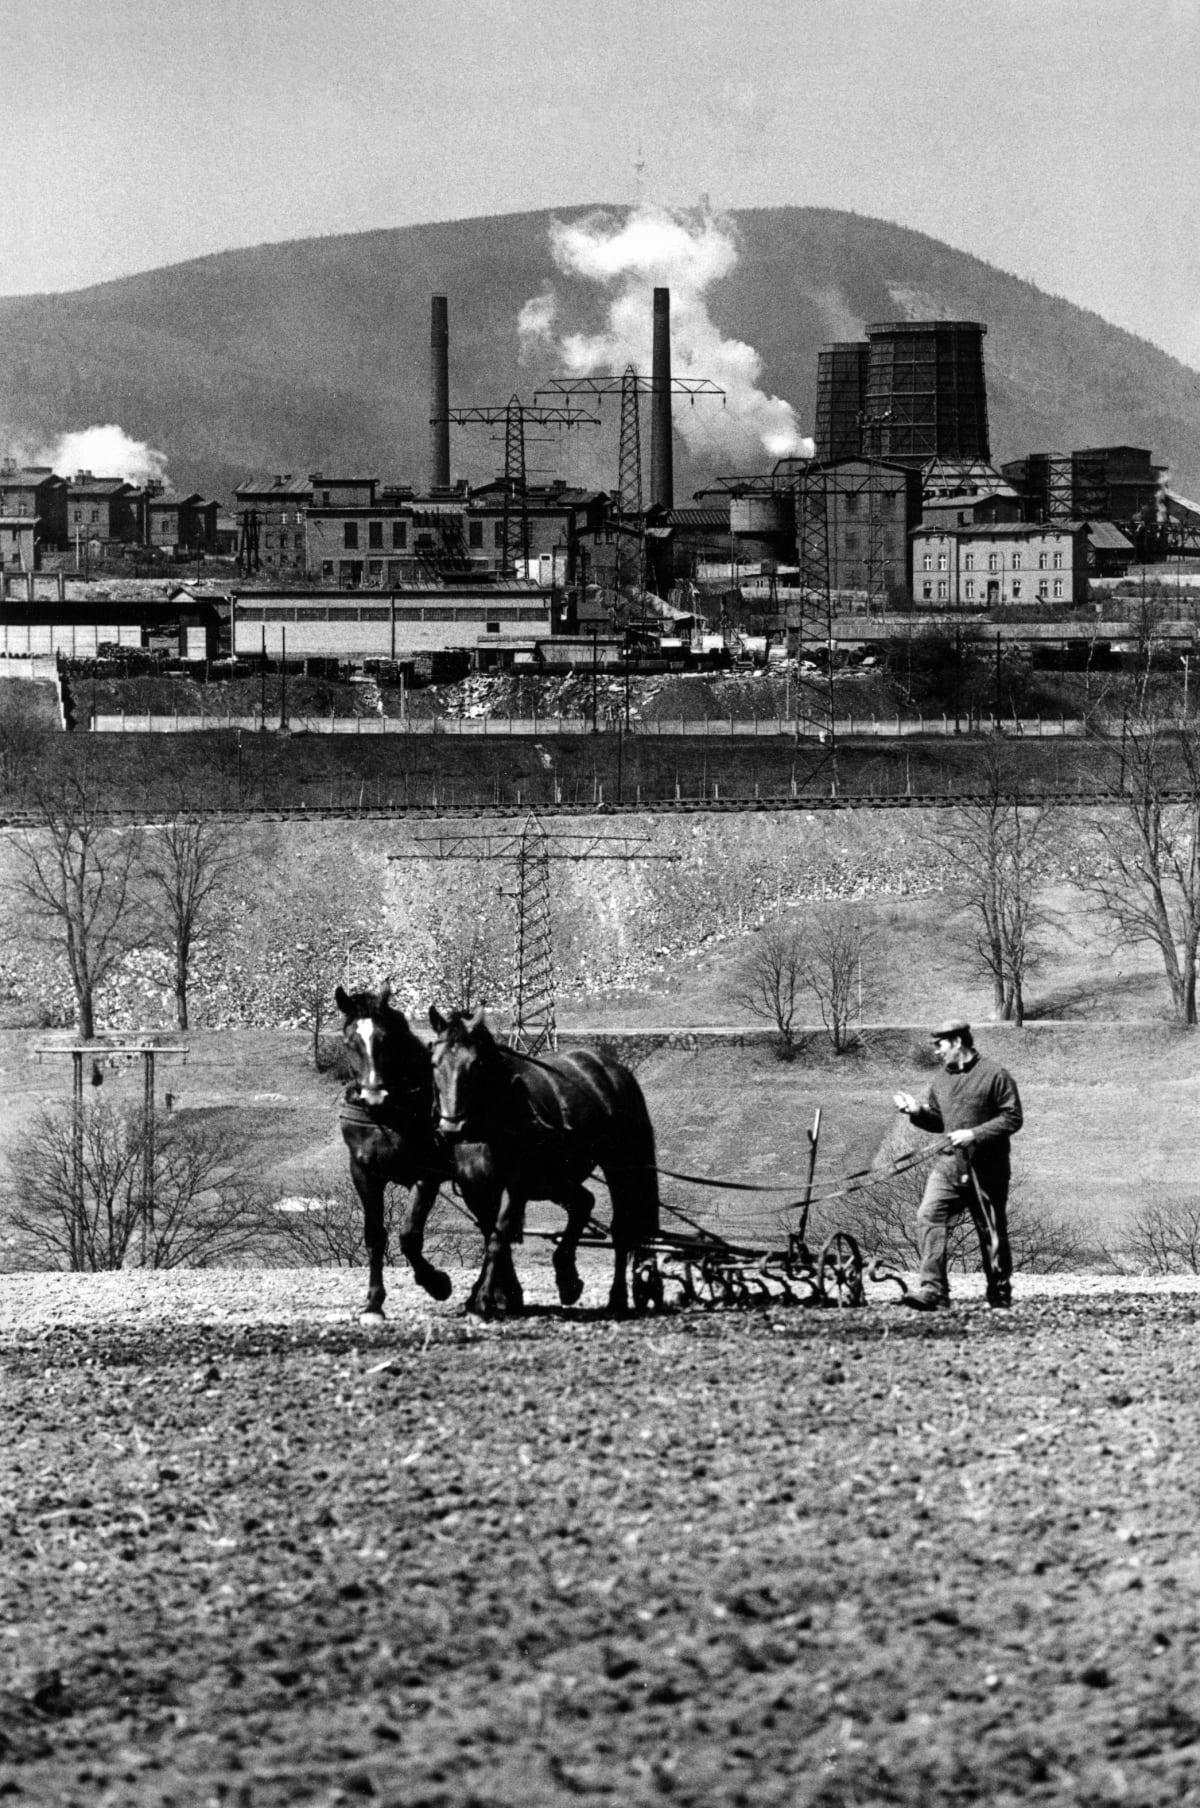 Michal Cala, 'Plowing'/ 'Orka', Walbrzych, 1975